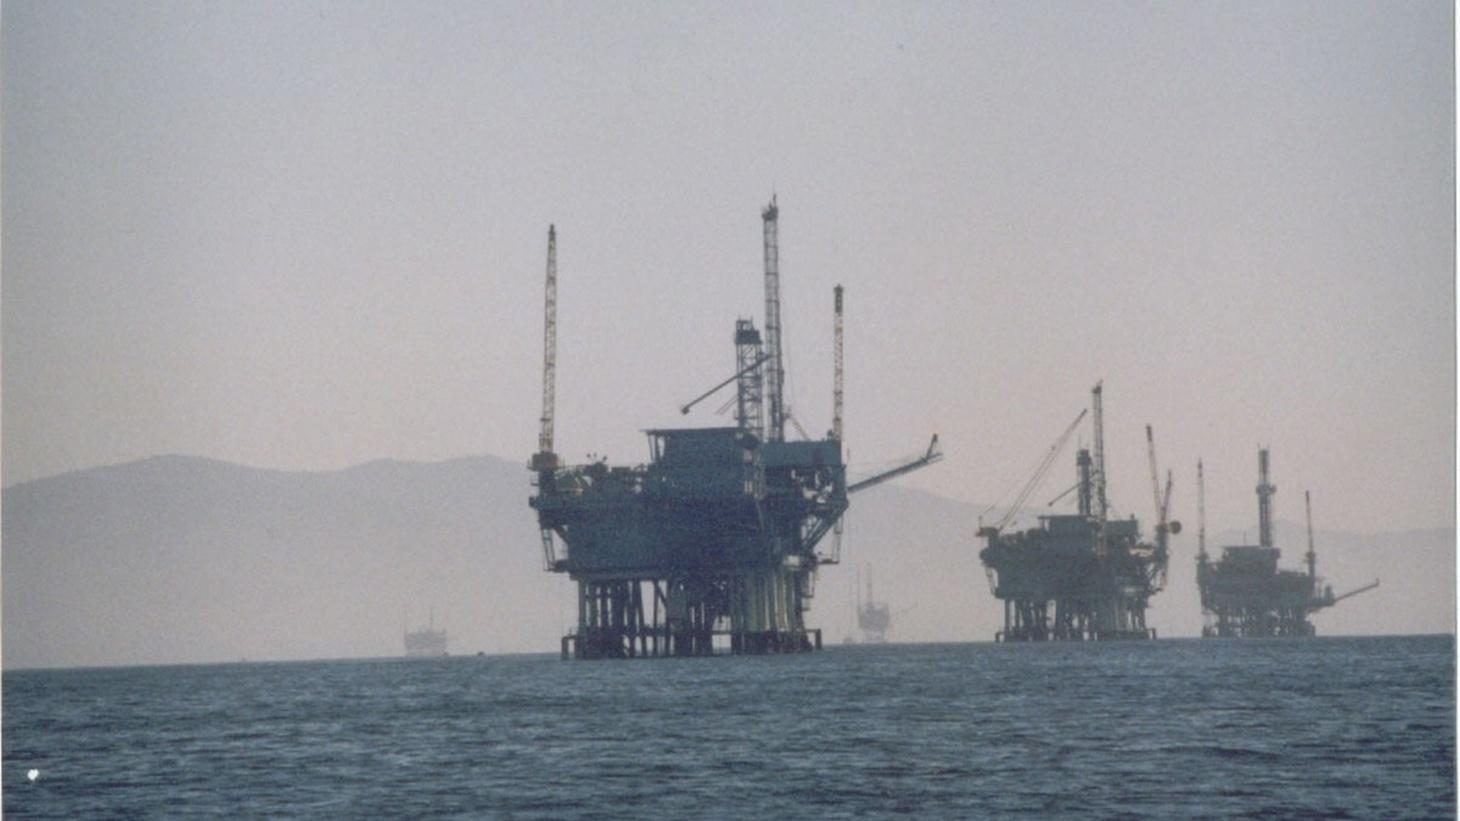 Oil rigs off the coast of California.